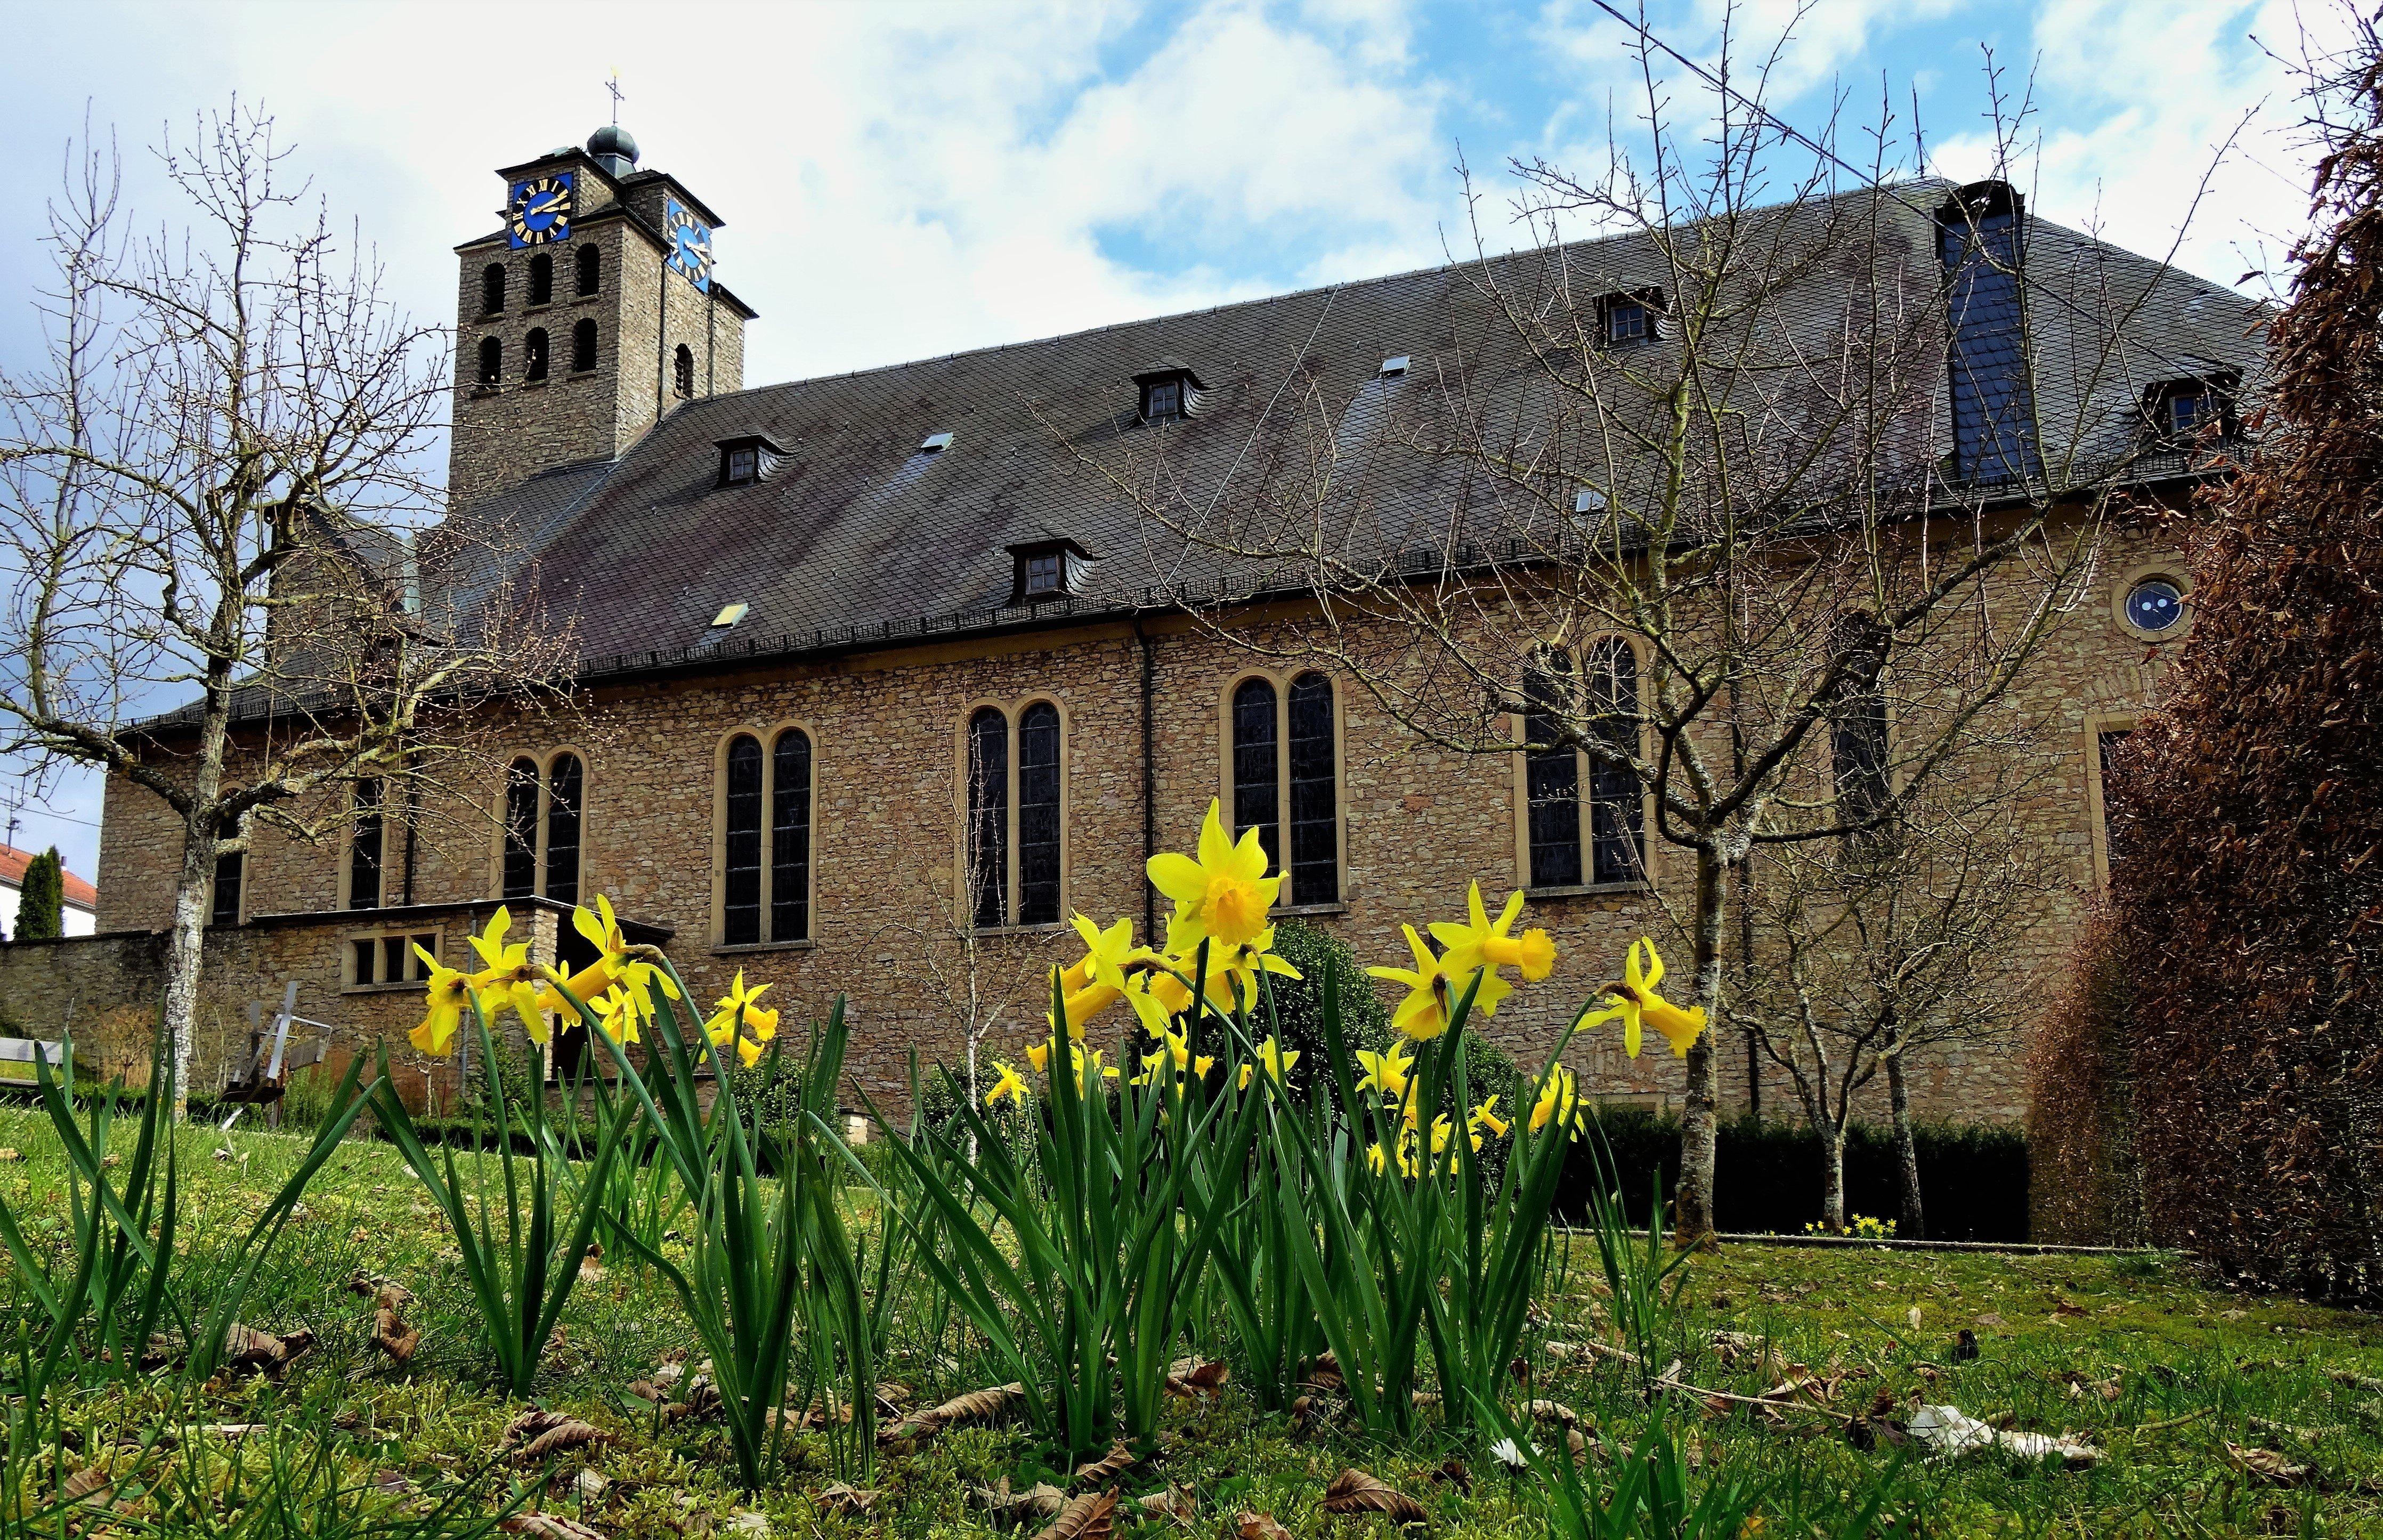 Pfarrkirche St Martin in Bietzen